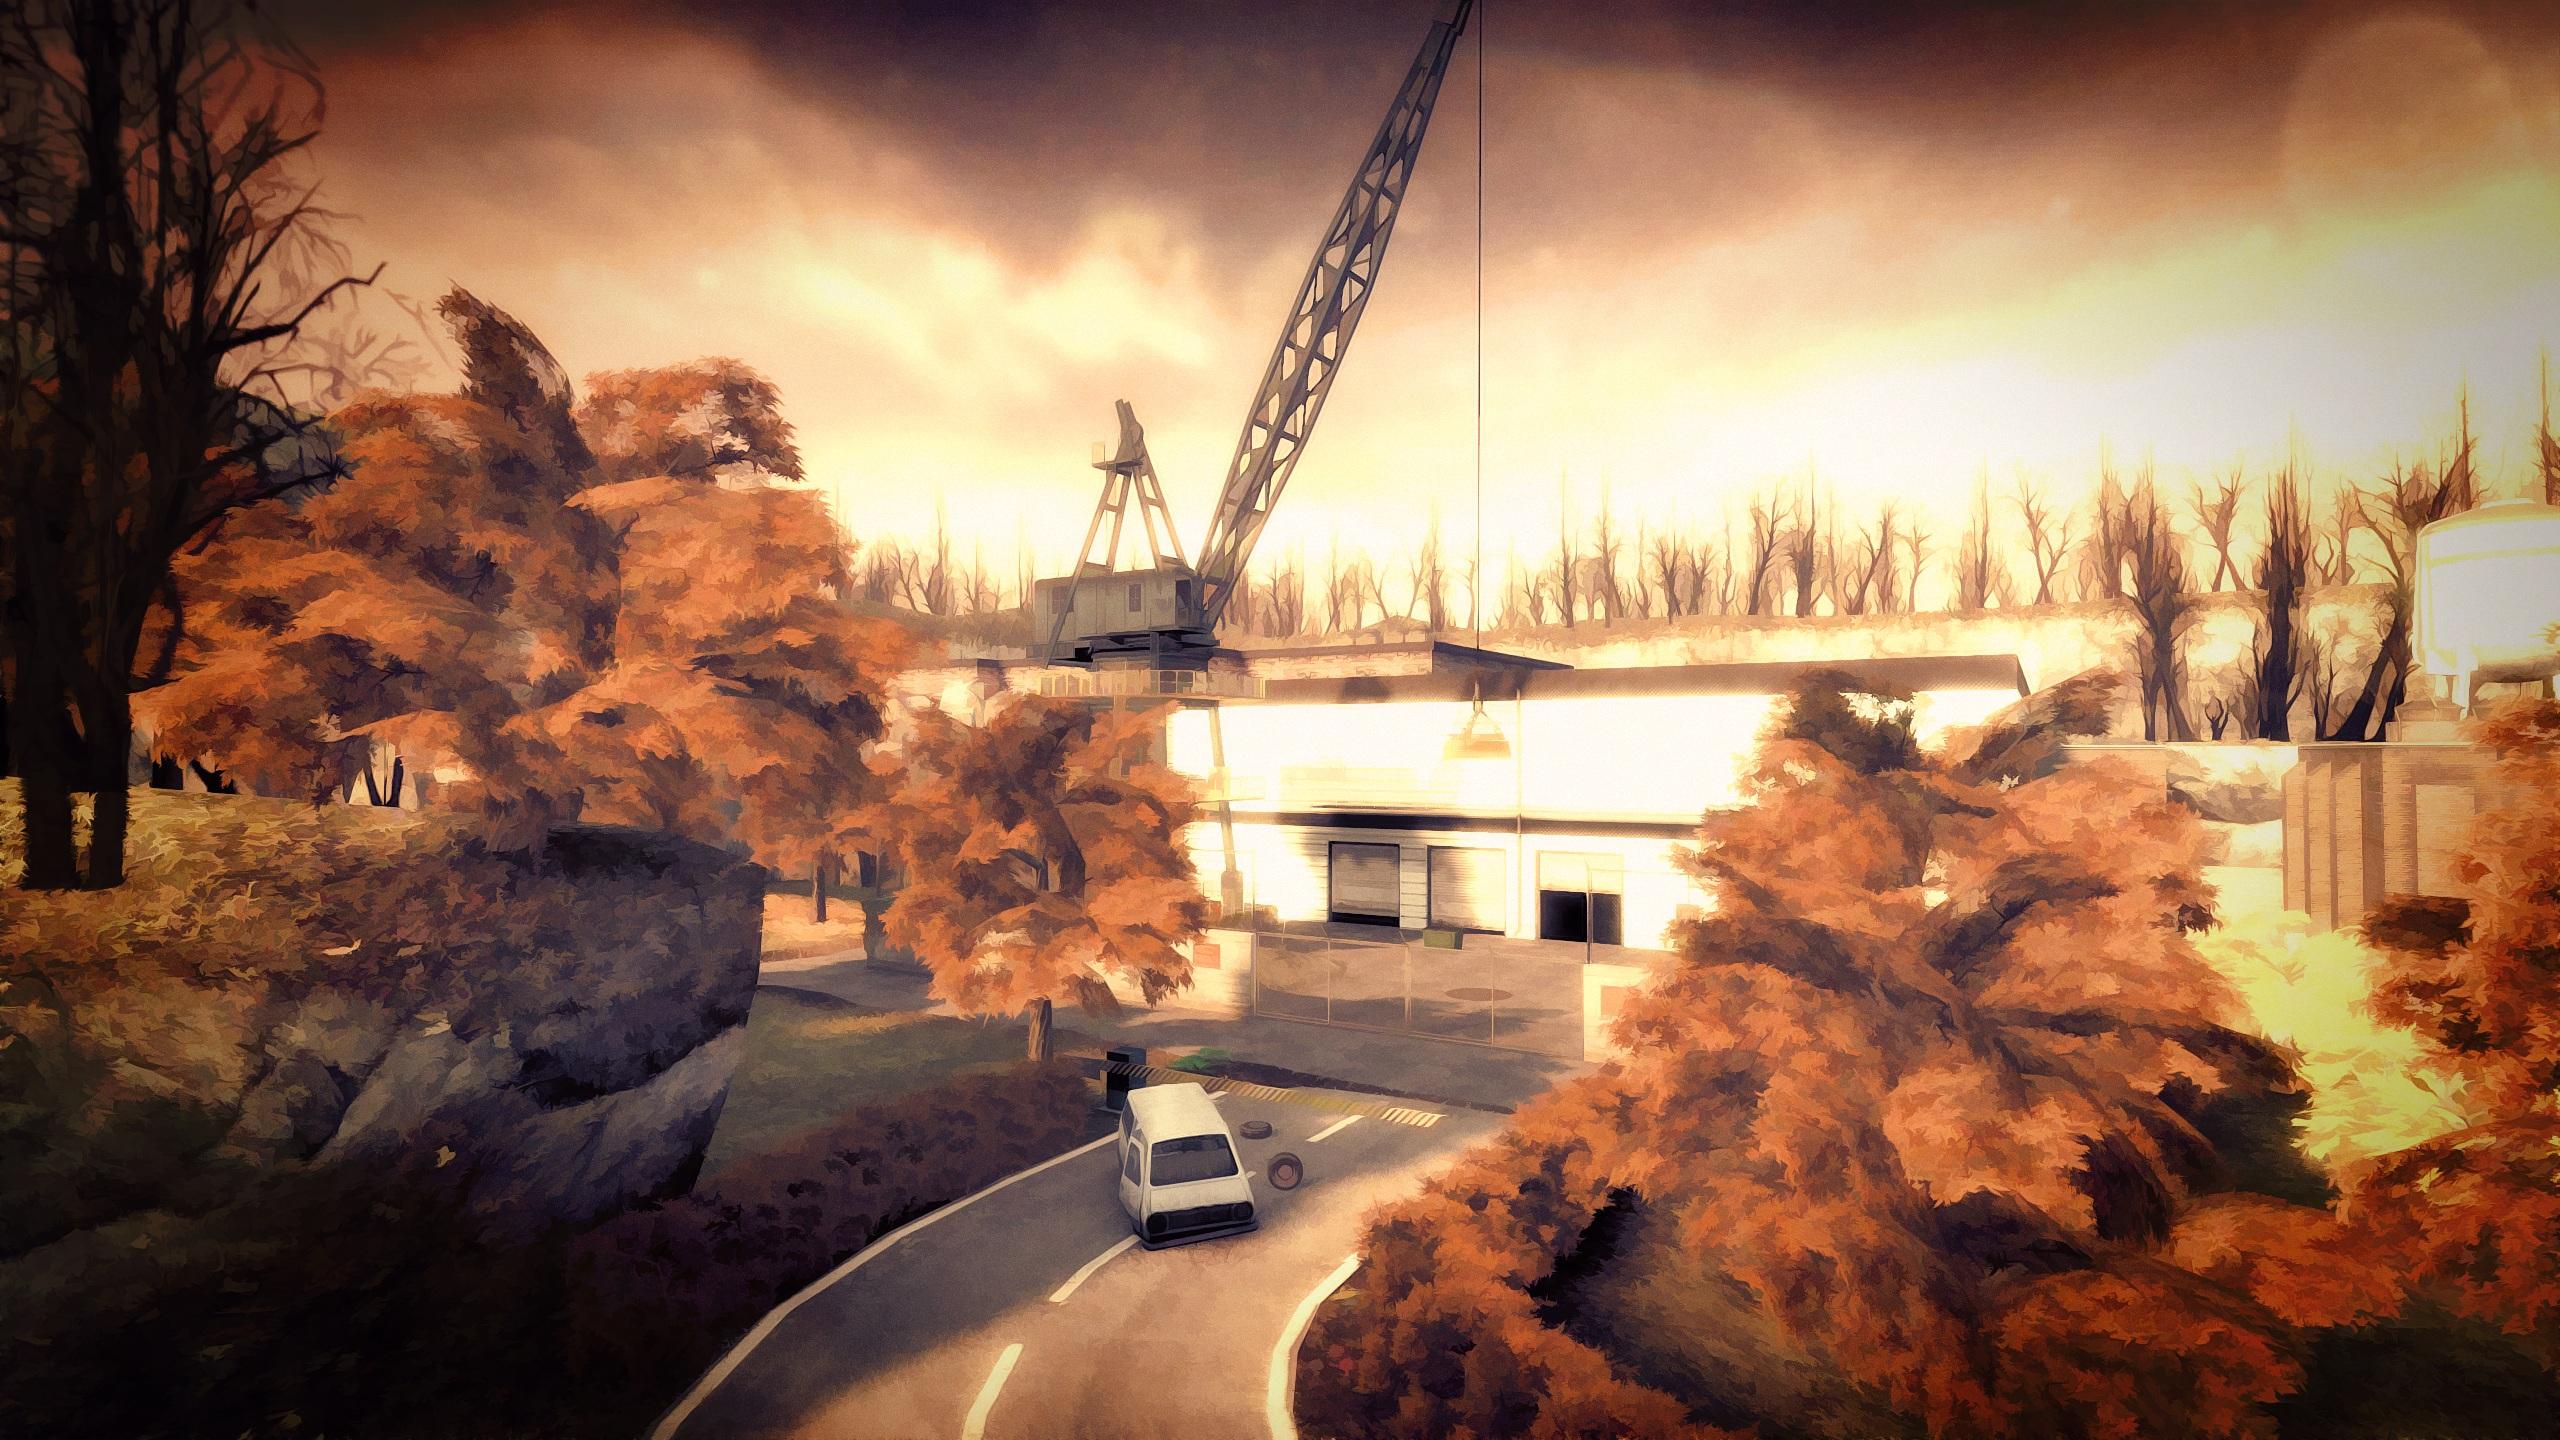 Estranged - Half Life 2 Mod